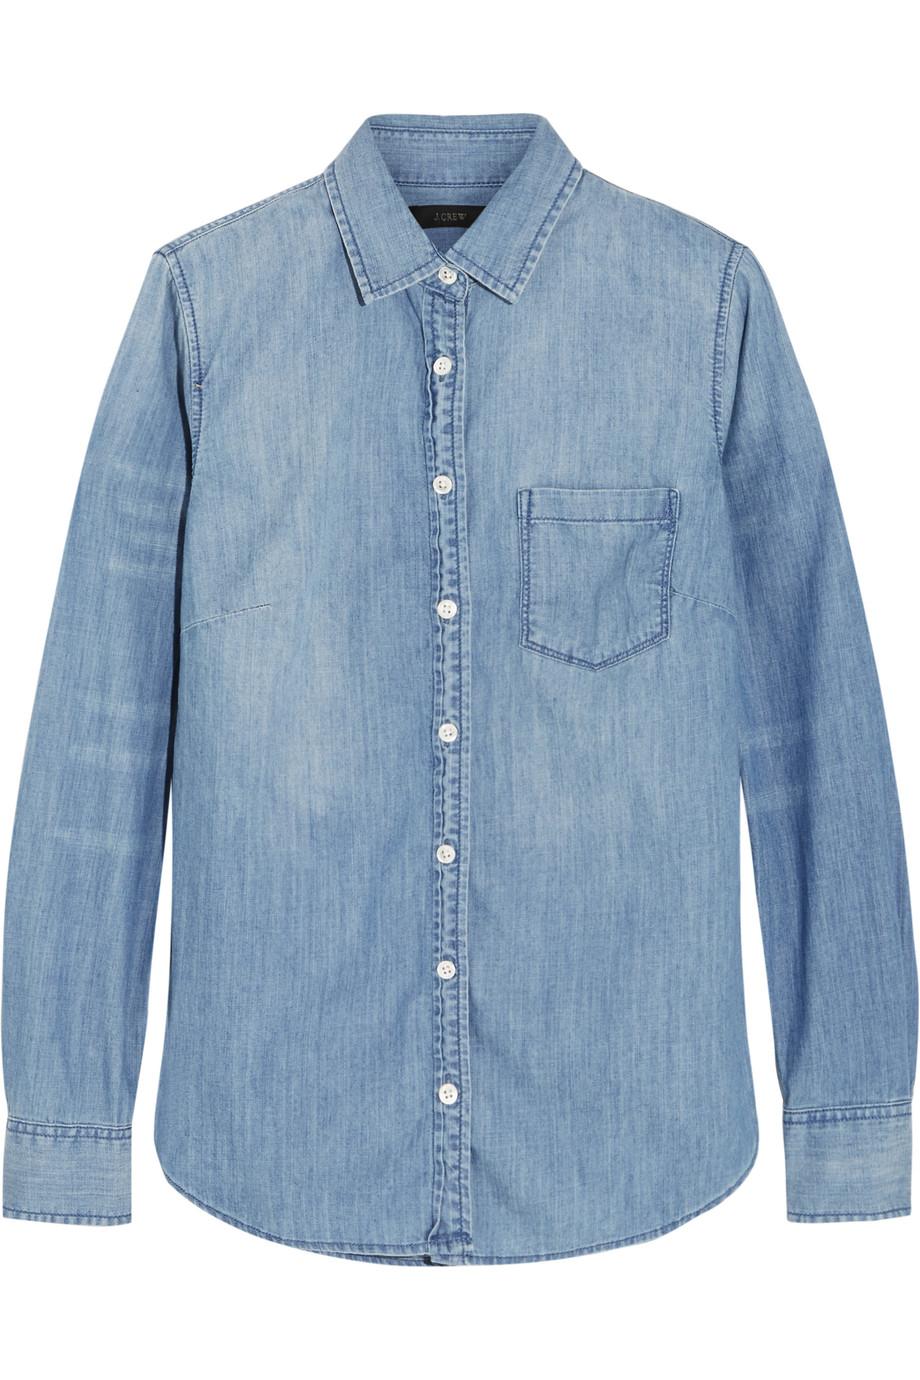 J.Crew Always Cotton-Chambray Shirt, Light Blue, Women's, Size: 8